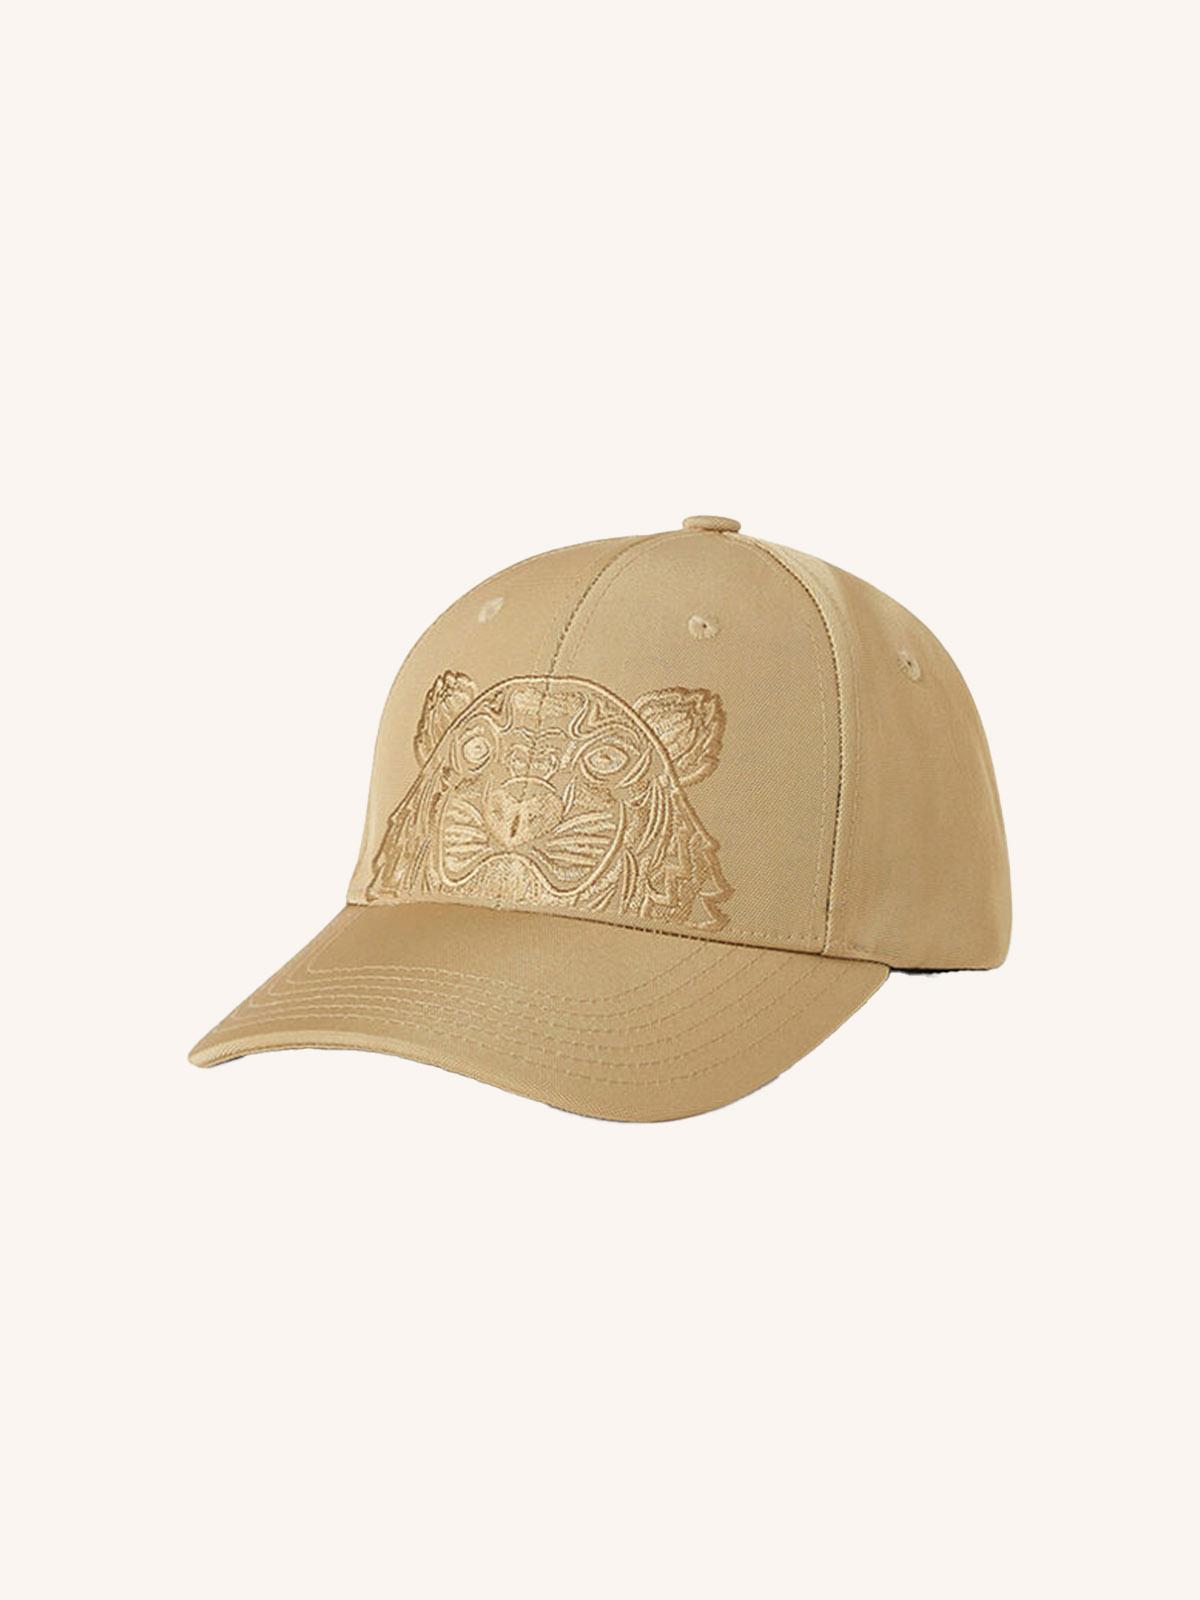 Kenzo - Canvas Kampus Tiger cap